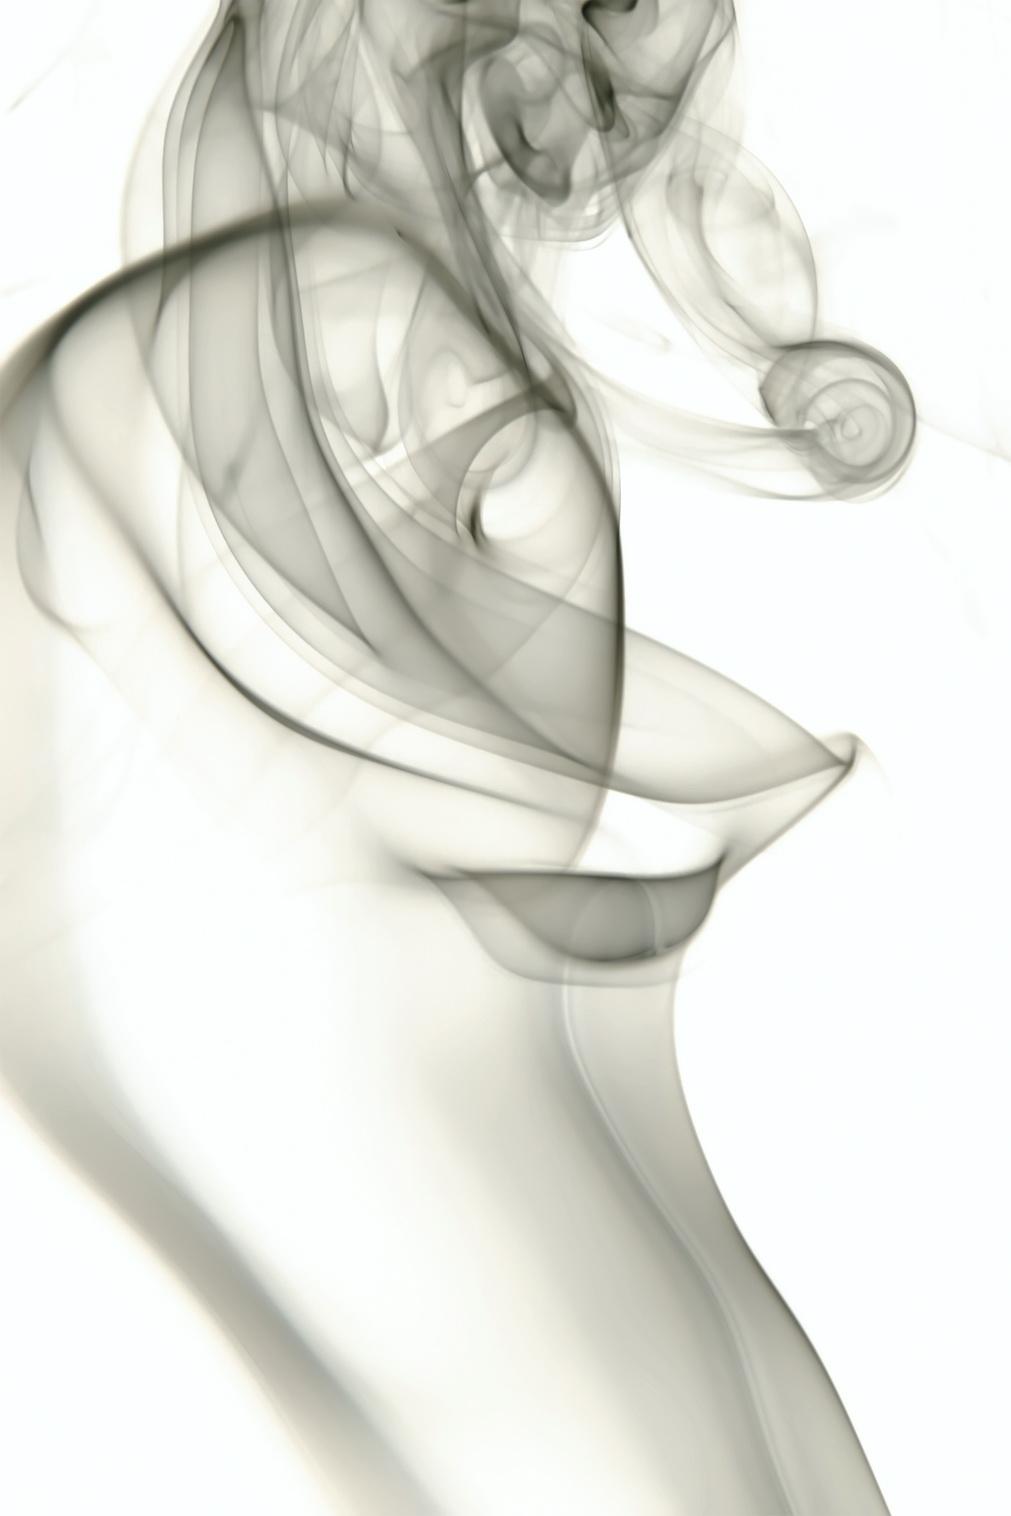 Gray Smoke, Abstract, Smell, Meditation, Meditative, HQ Photo